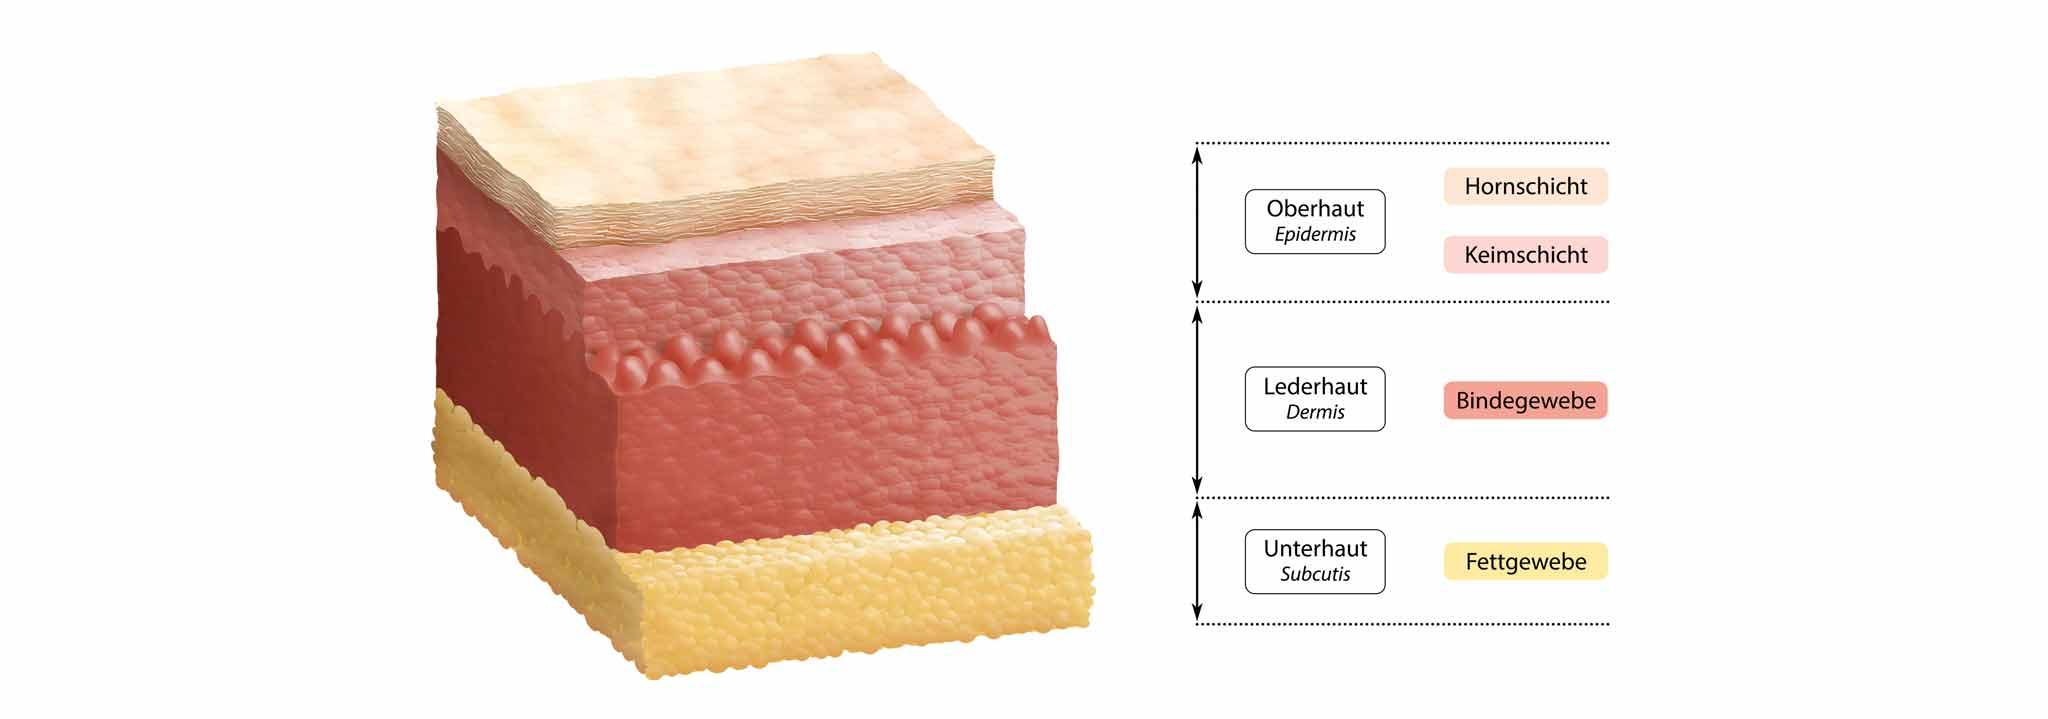 ceramol-hautpflege-aufbau-haut-barriere